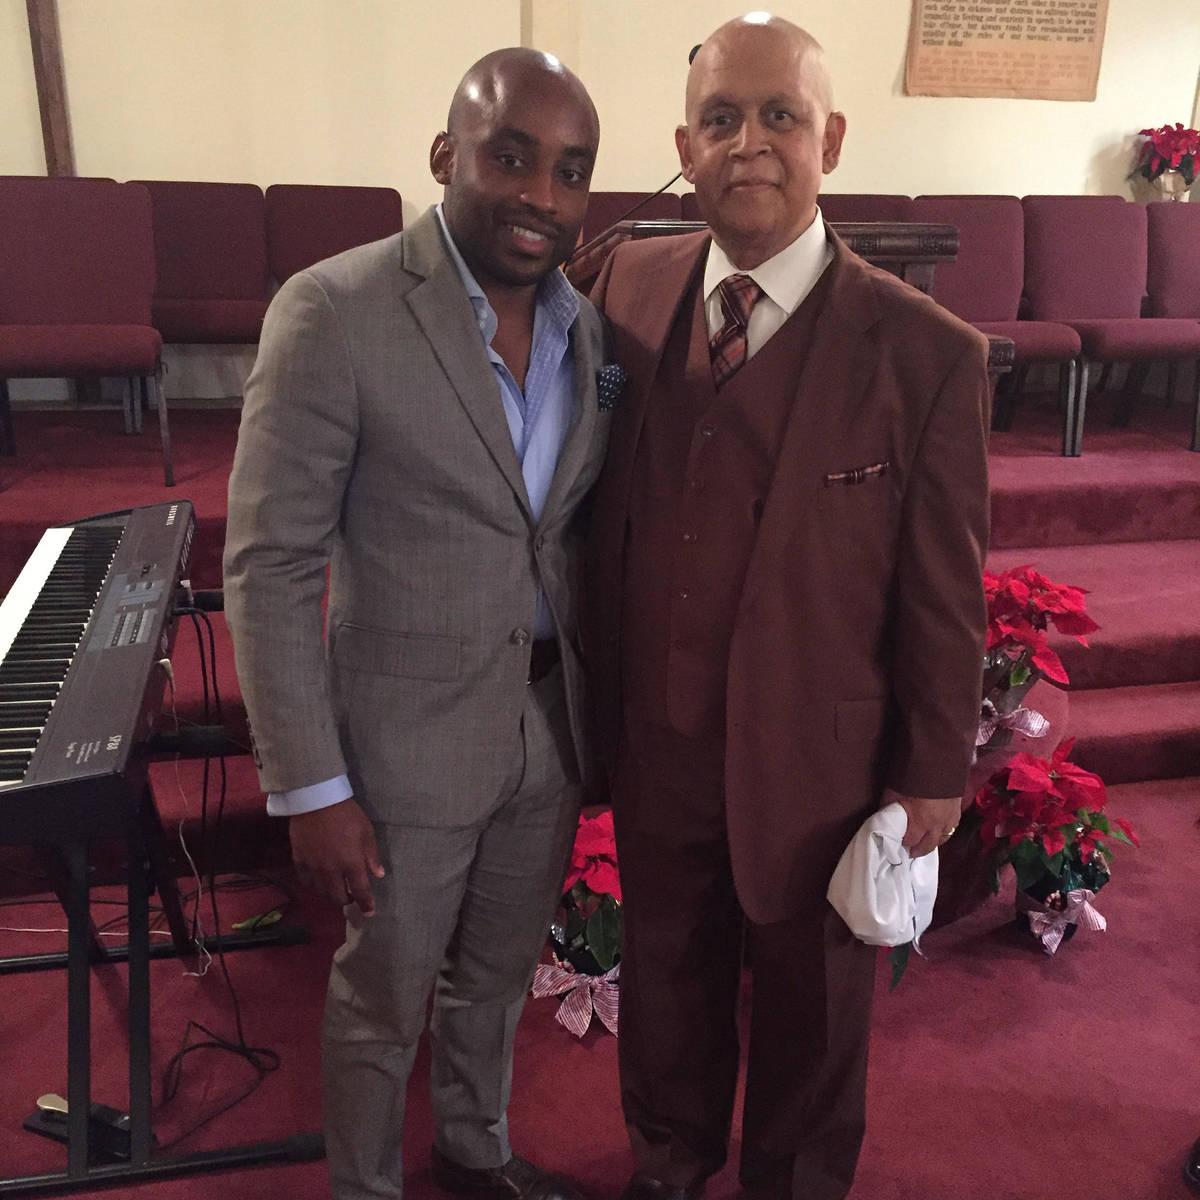 Javon Johnson, director of African American & African Diaspora Studies at UNLV, is shown with h ...